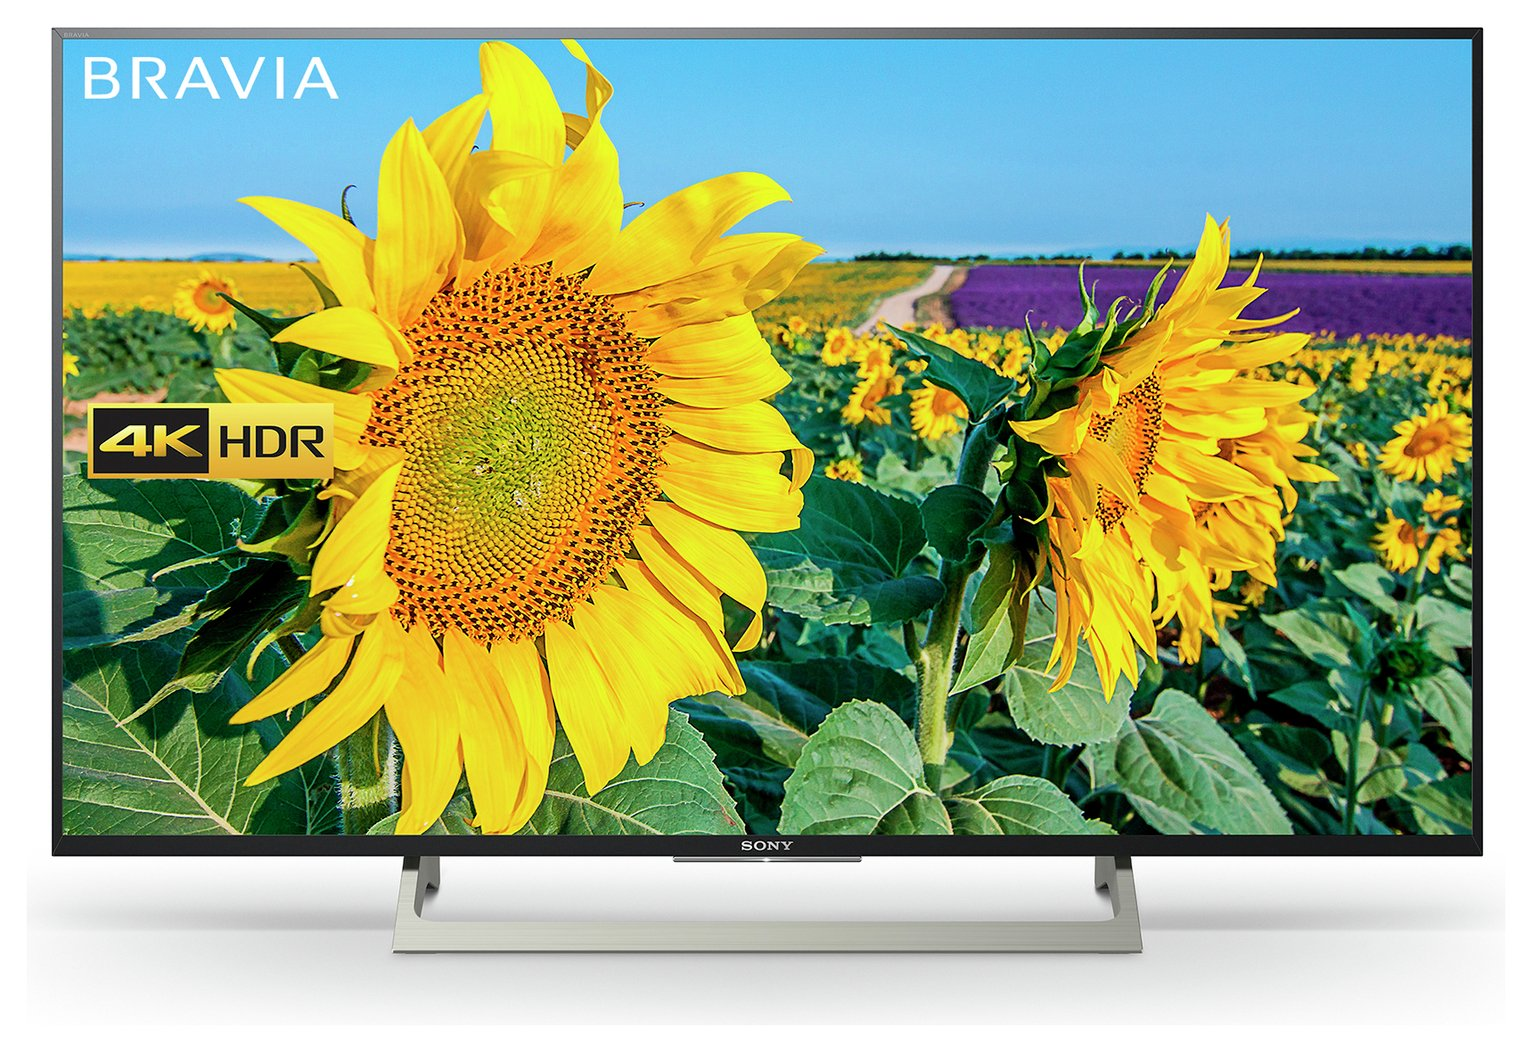 Sony Bravia 49 Inch KD49XF8096 Smart 4K Ultra HD TV with HDR